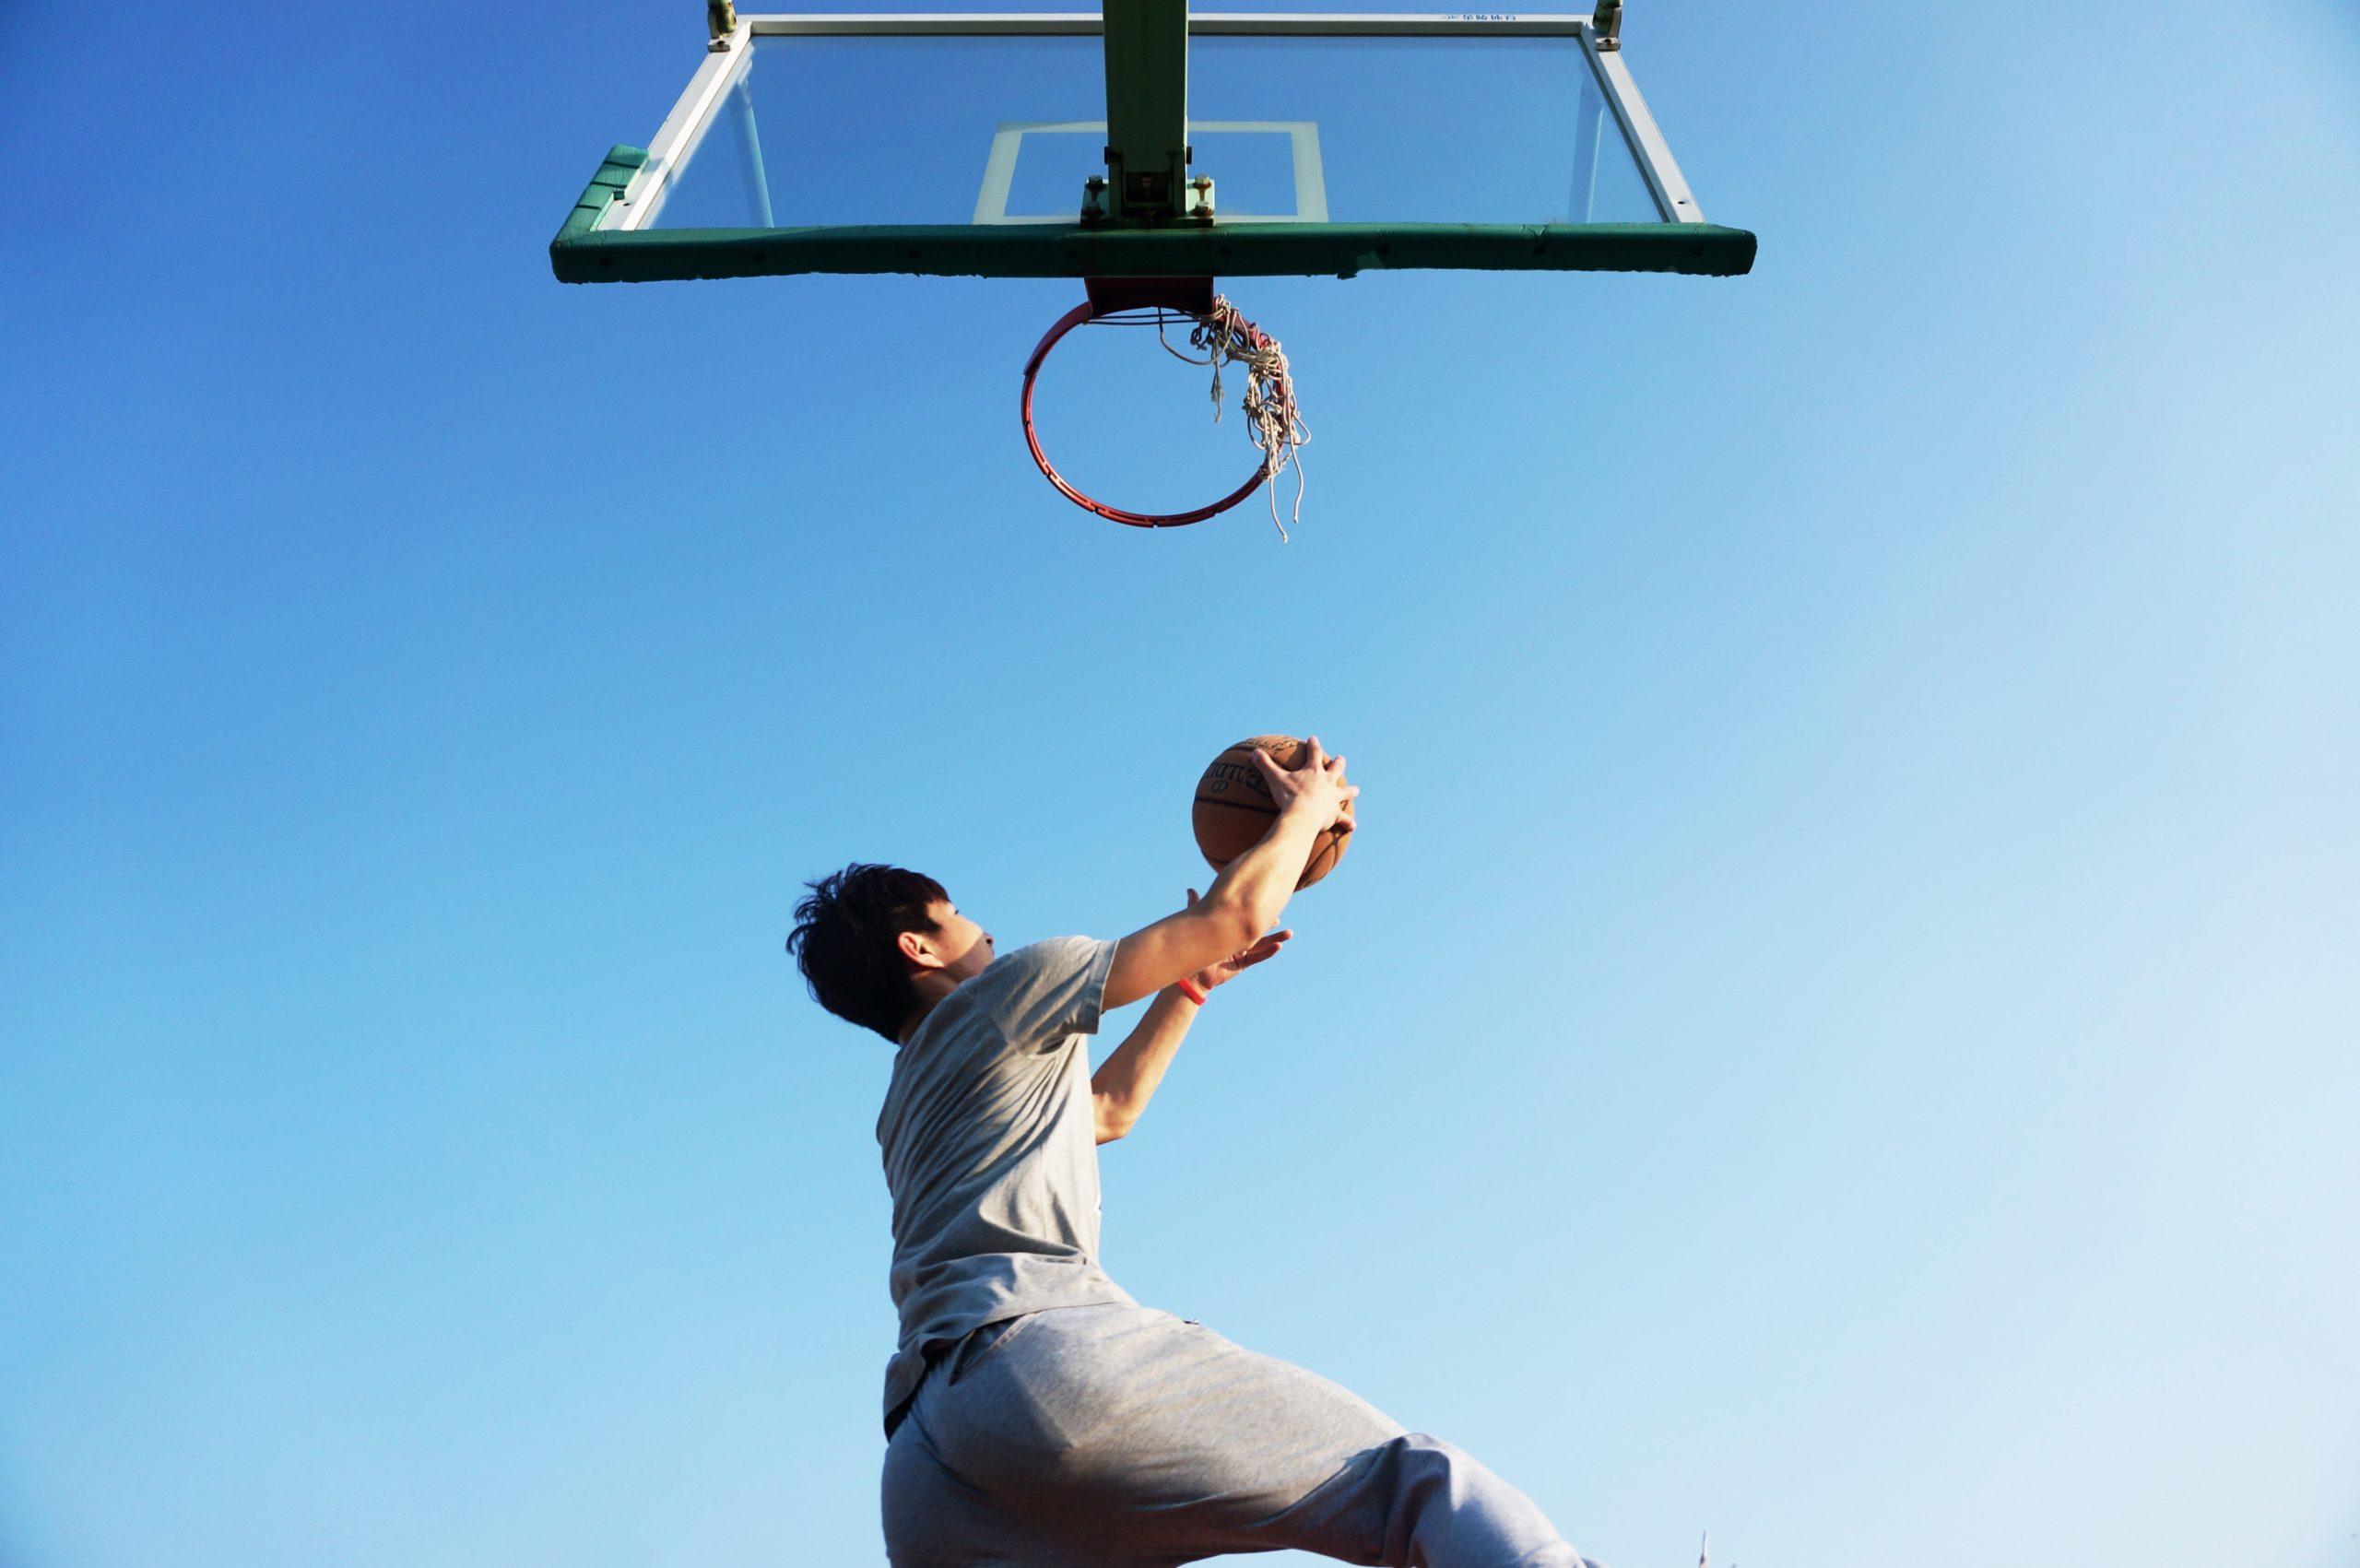 Sportisimo e-shop: Recenze a zkušenosti